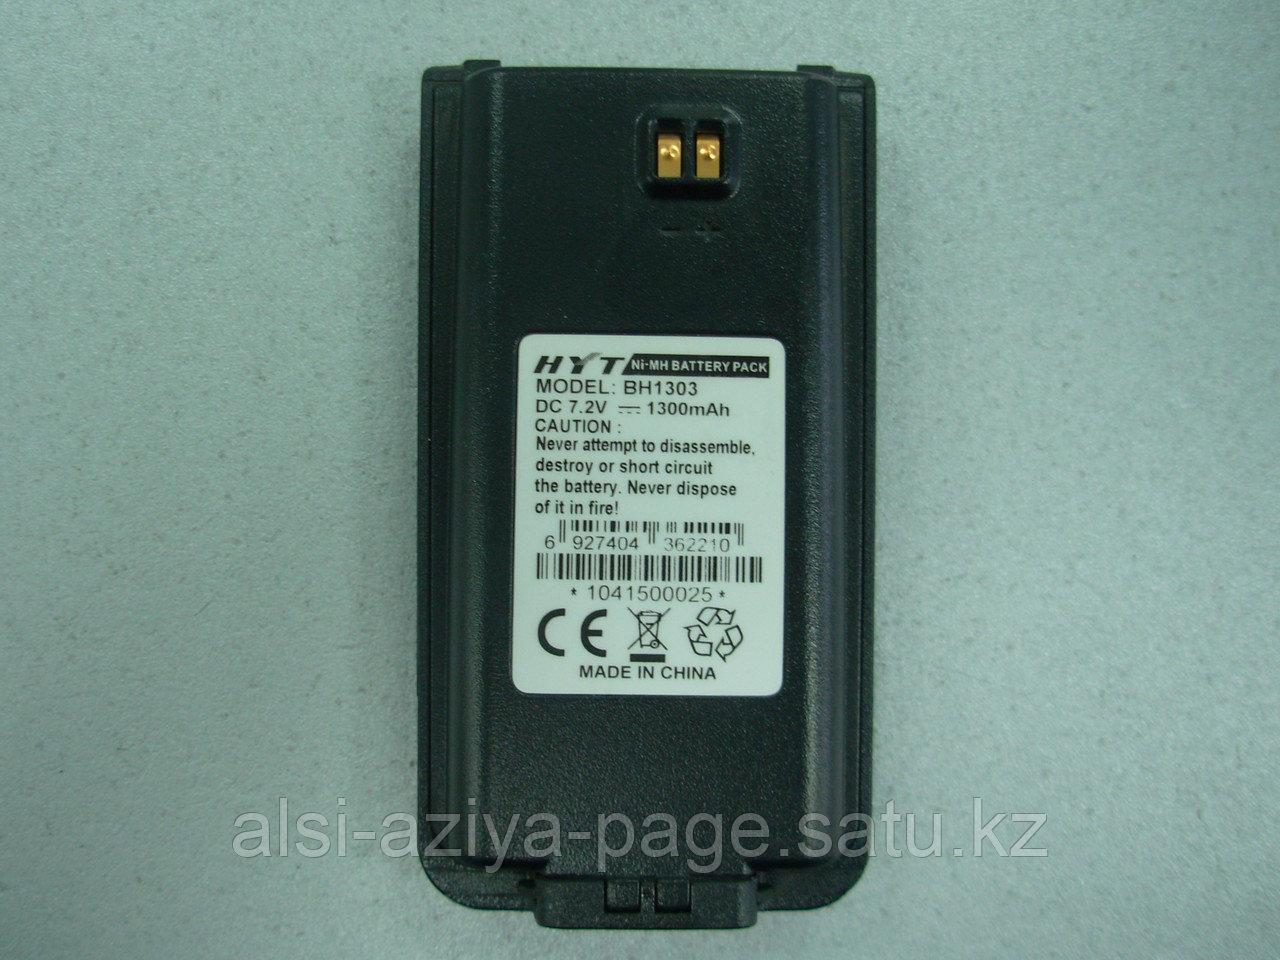 Аккумулятор HYT  для ТС-610